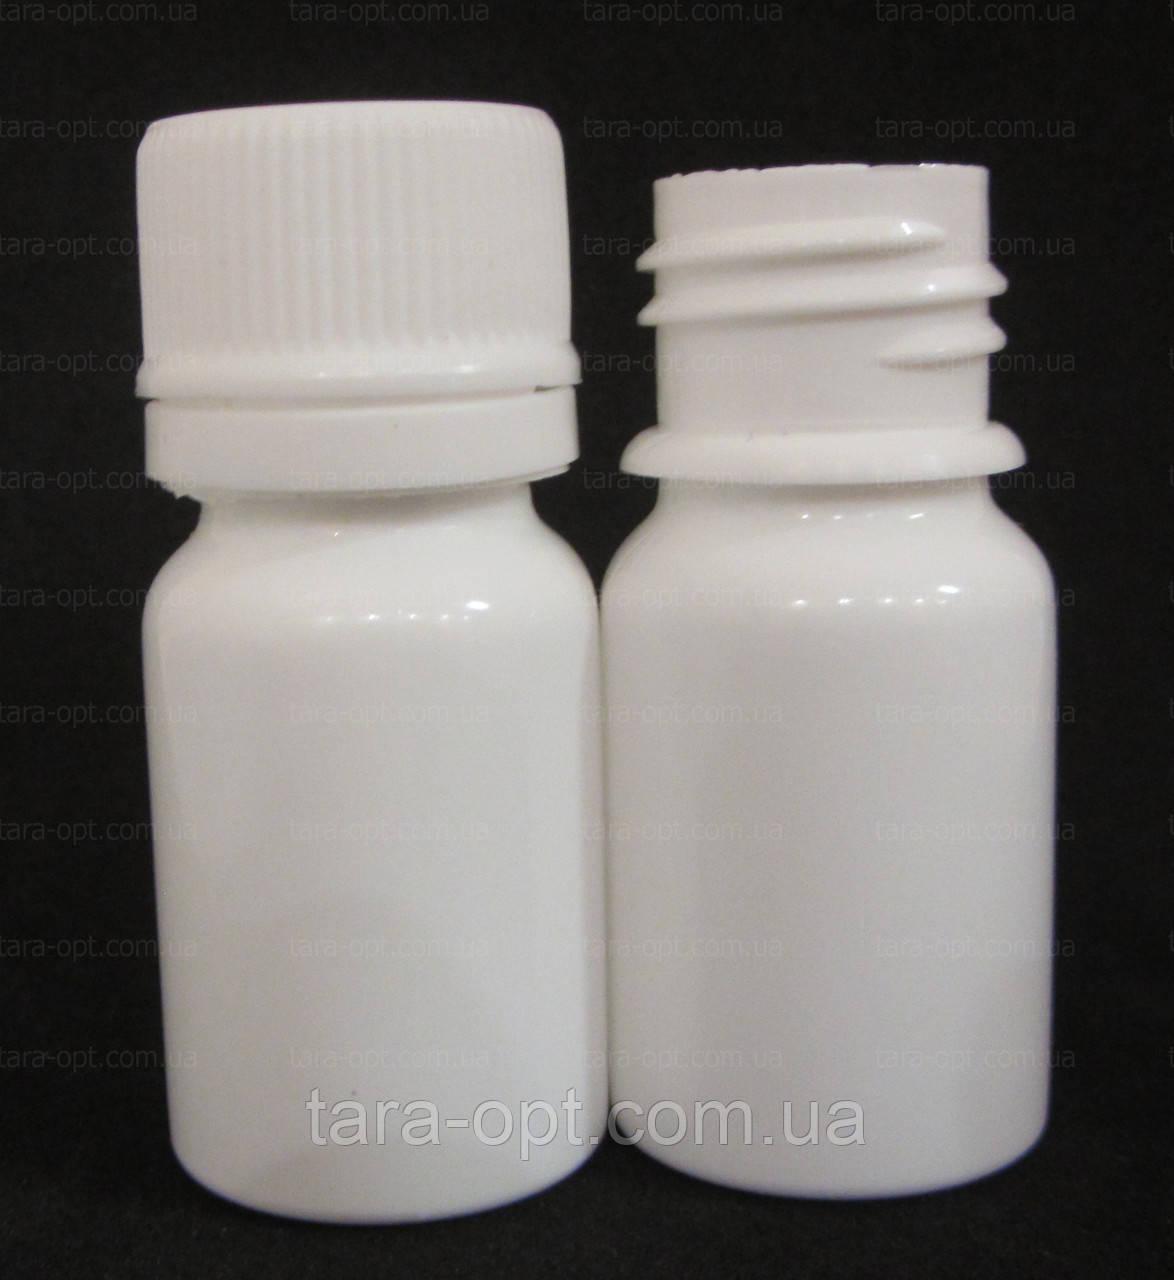 Флакон непрозрачный 10 мл, (Цена от 1,55 грн)*